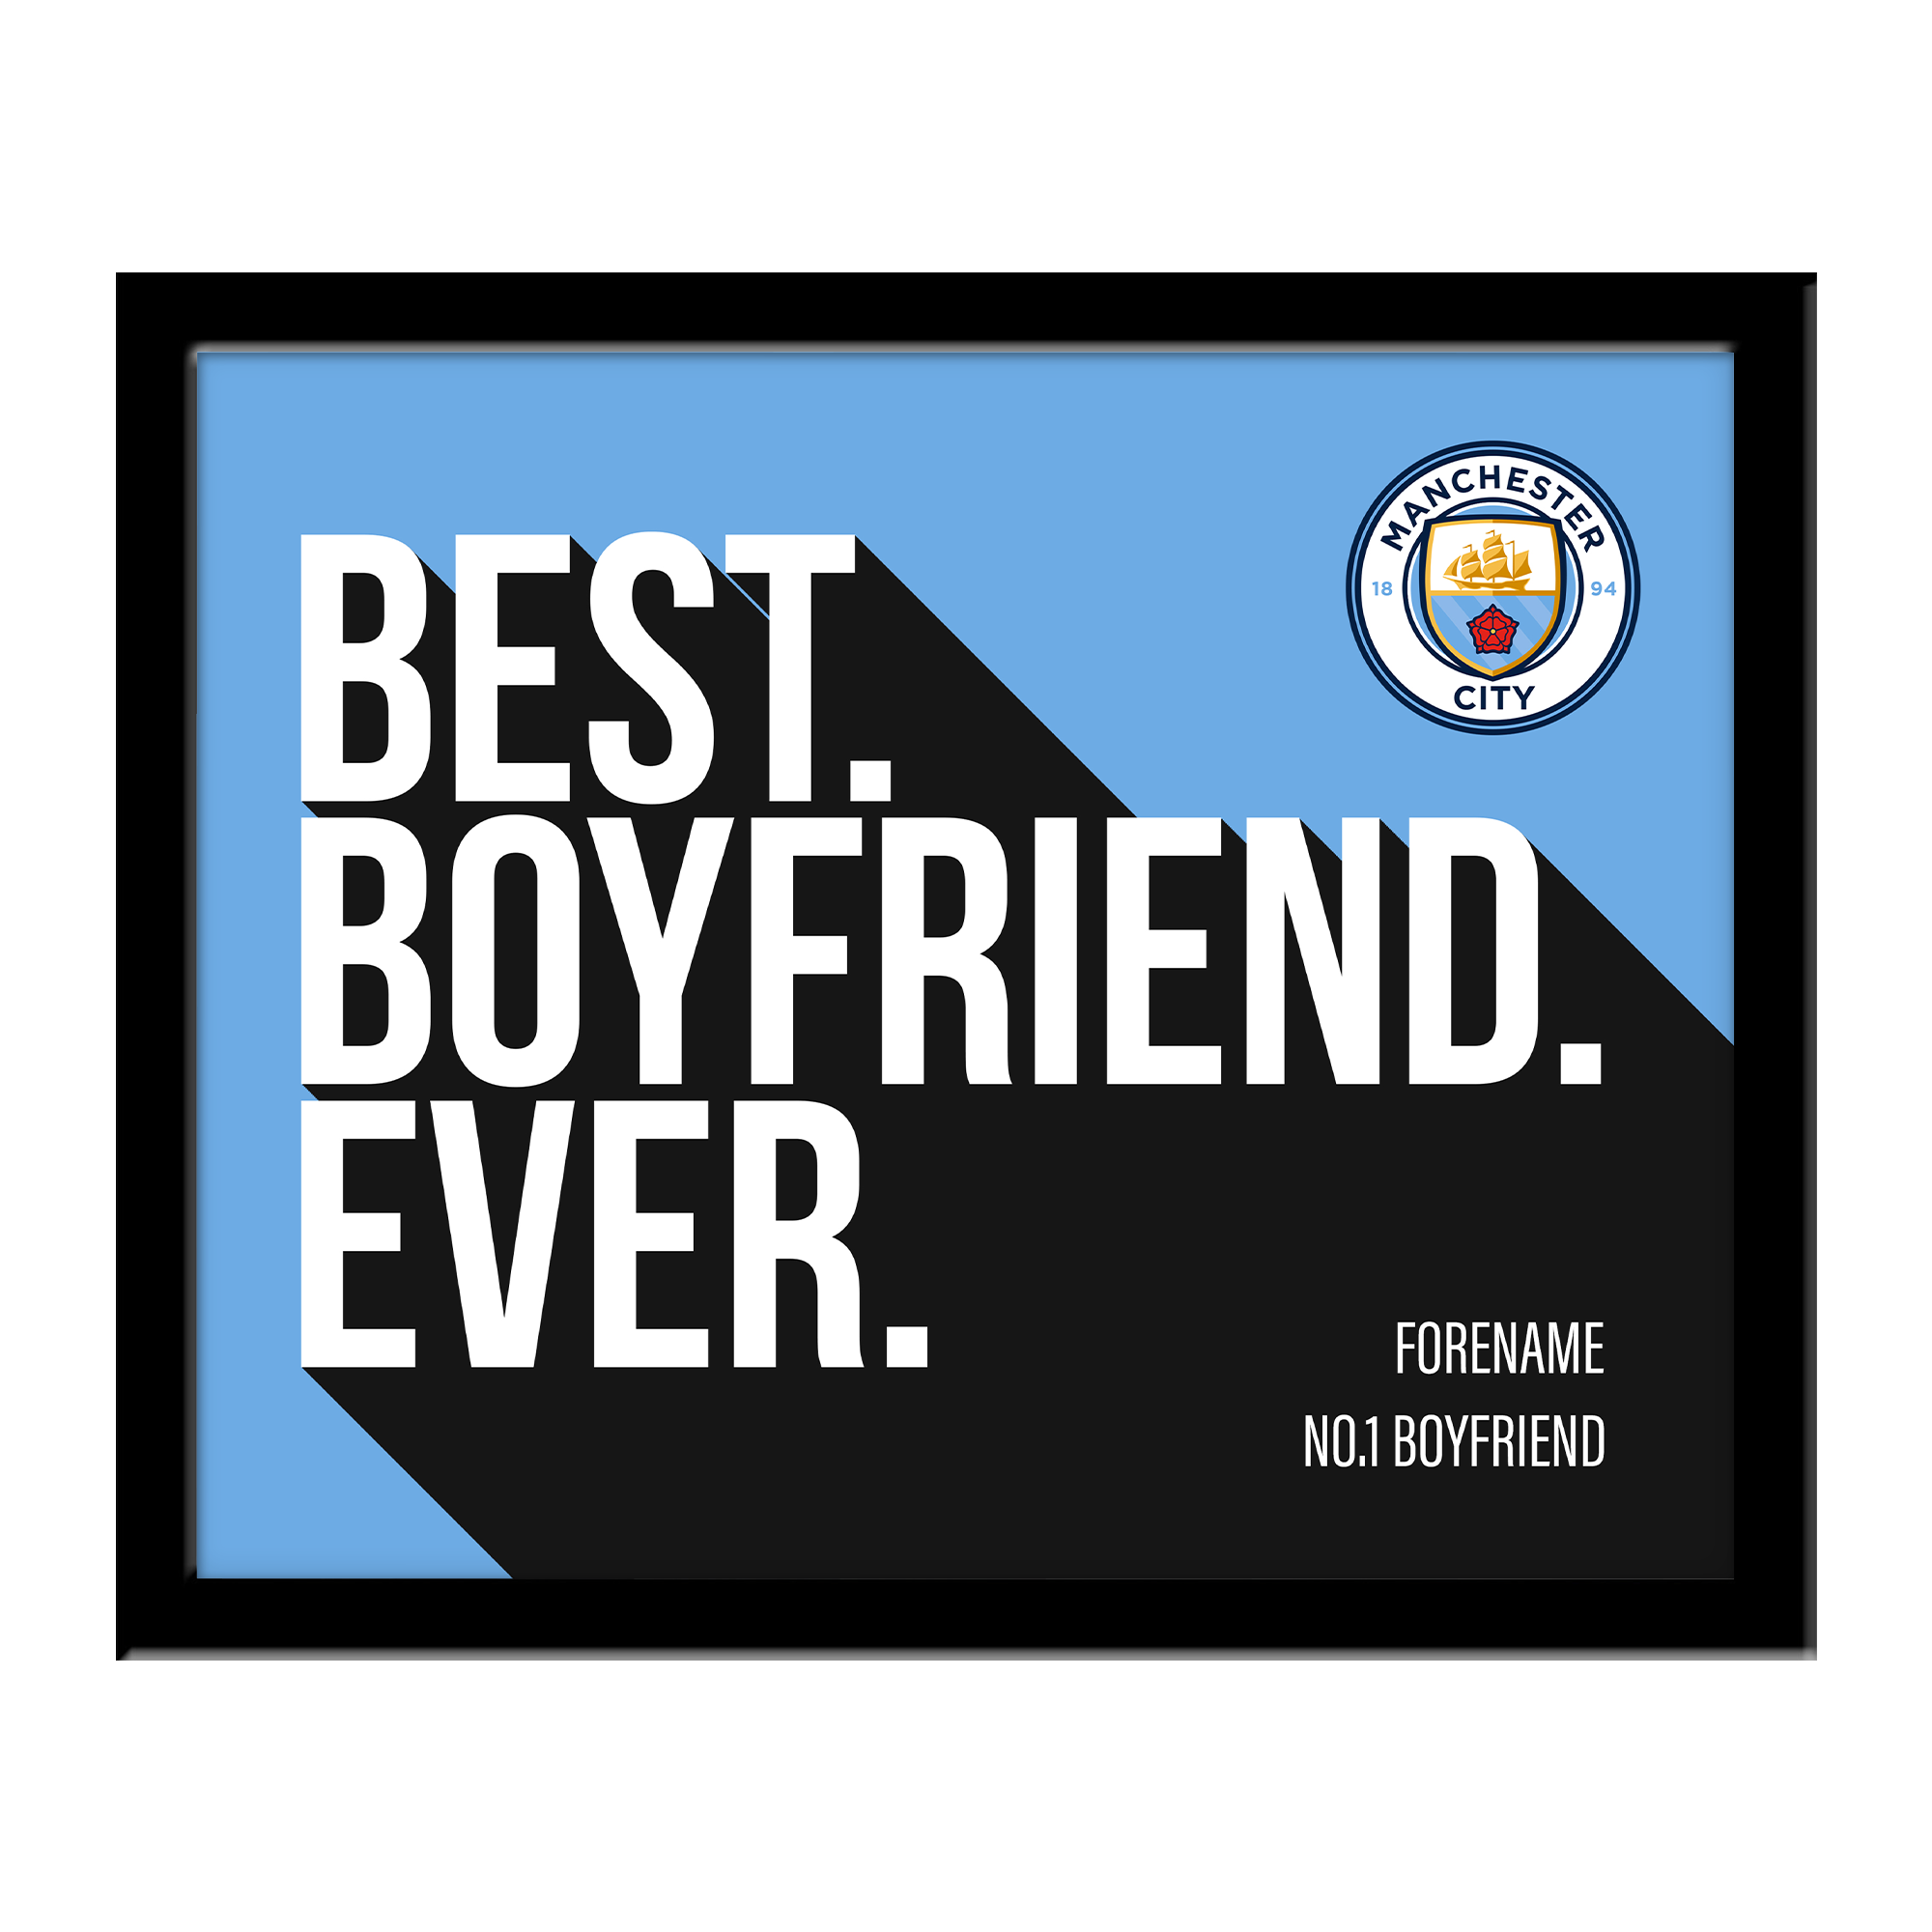 Manchester City FC Best Boyfriend Ever 10 x 8 Photo Framed